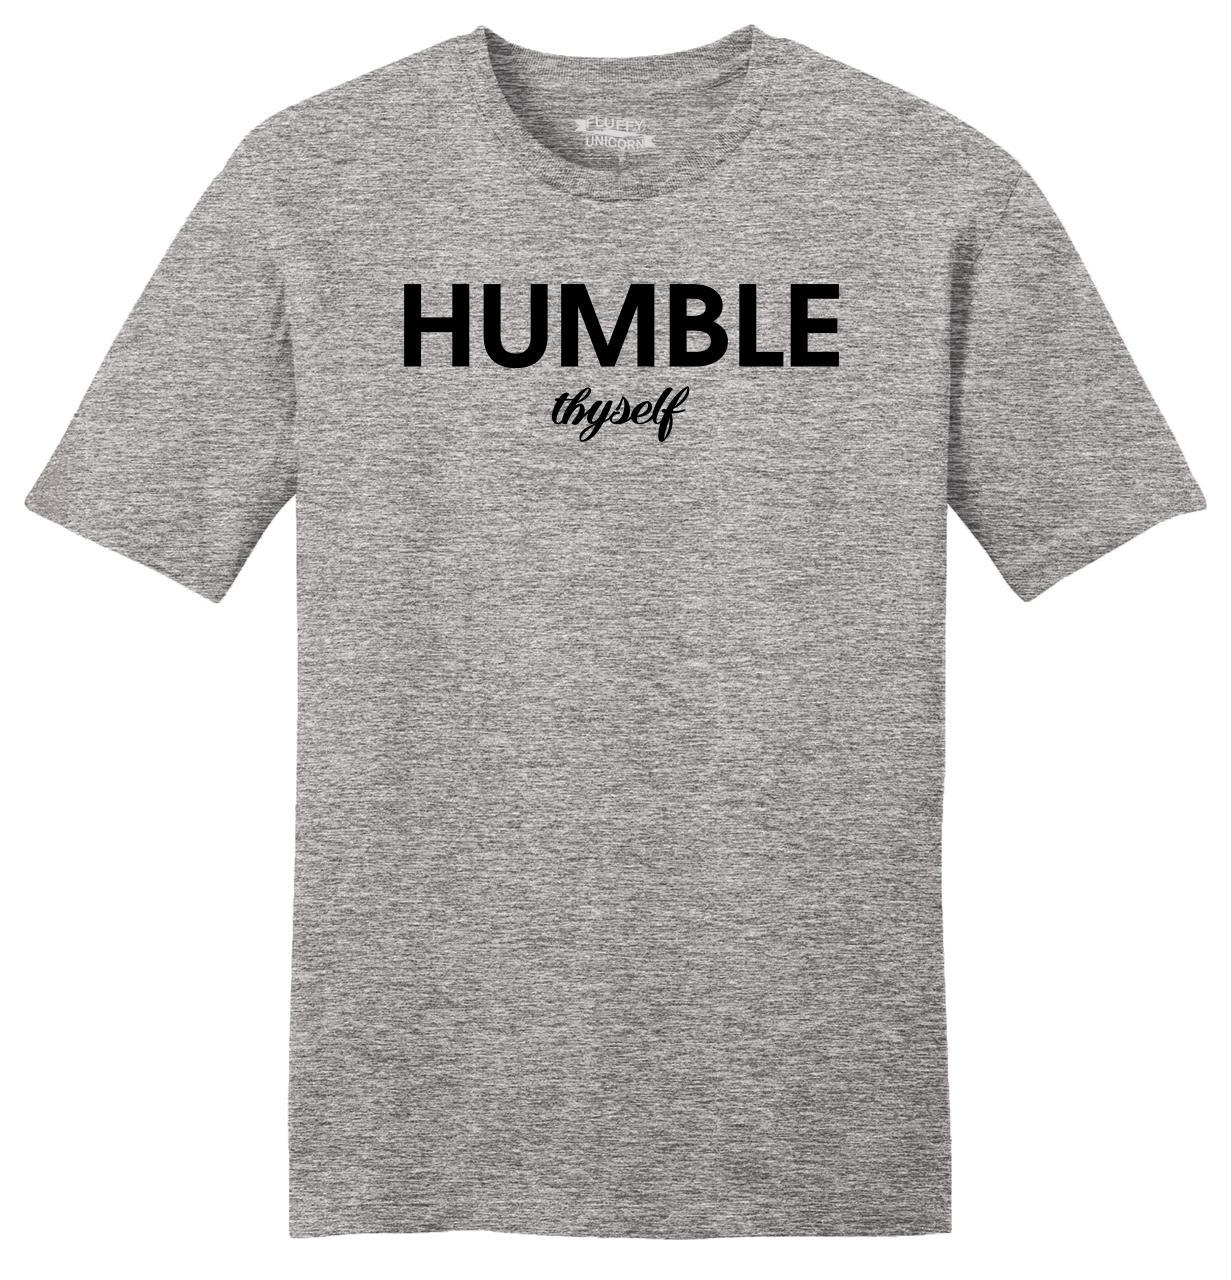 Humble-Thyself-Mens-Soft-T-Shirt-Religious-Inspirational-Yogi-Gift-Tee-Shirt-Z2 thumbnail 12